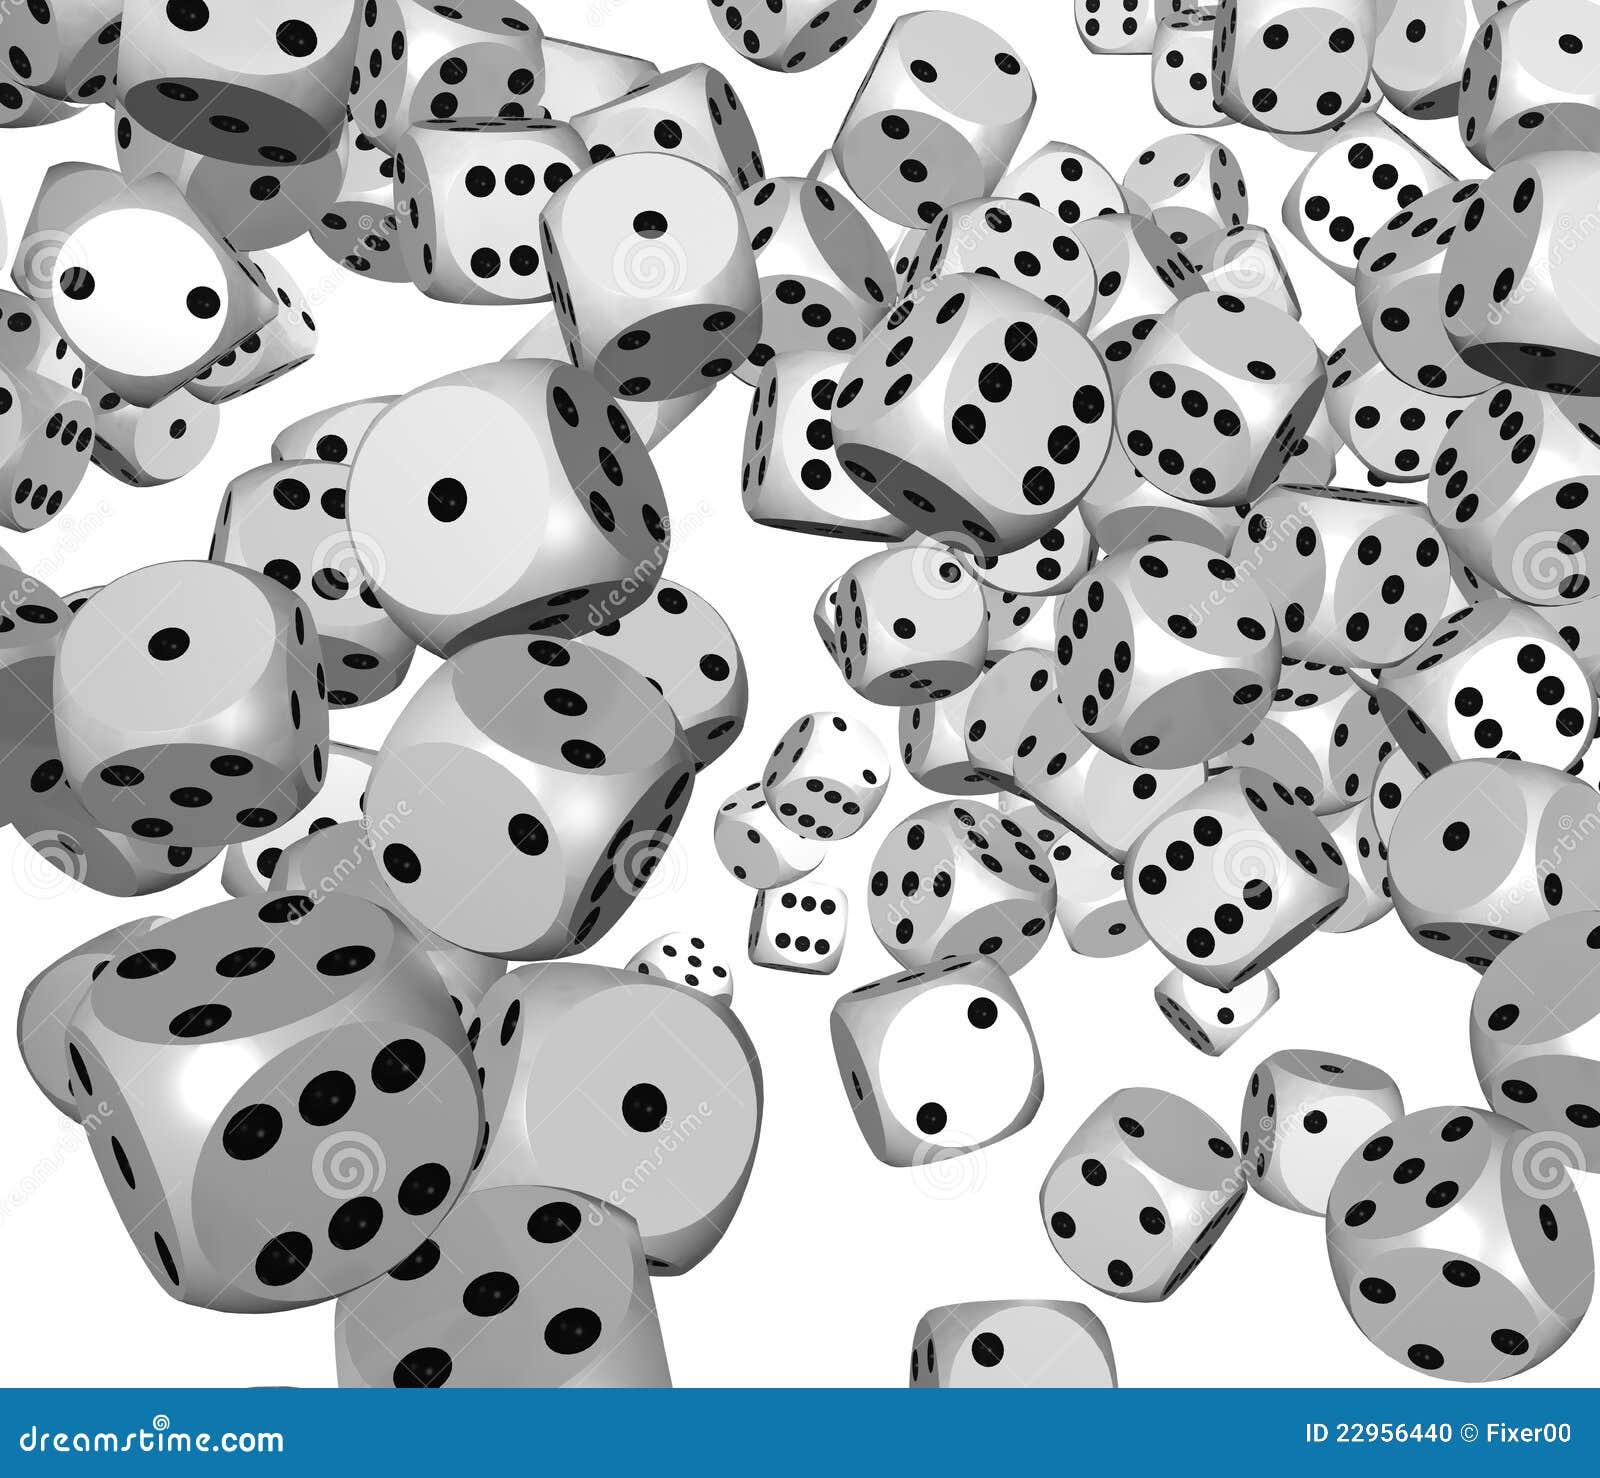 Play free blackjack wizard of odds